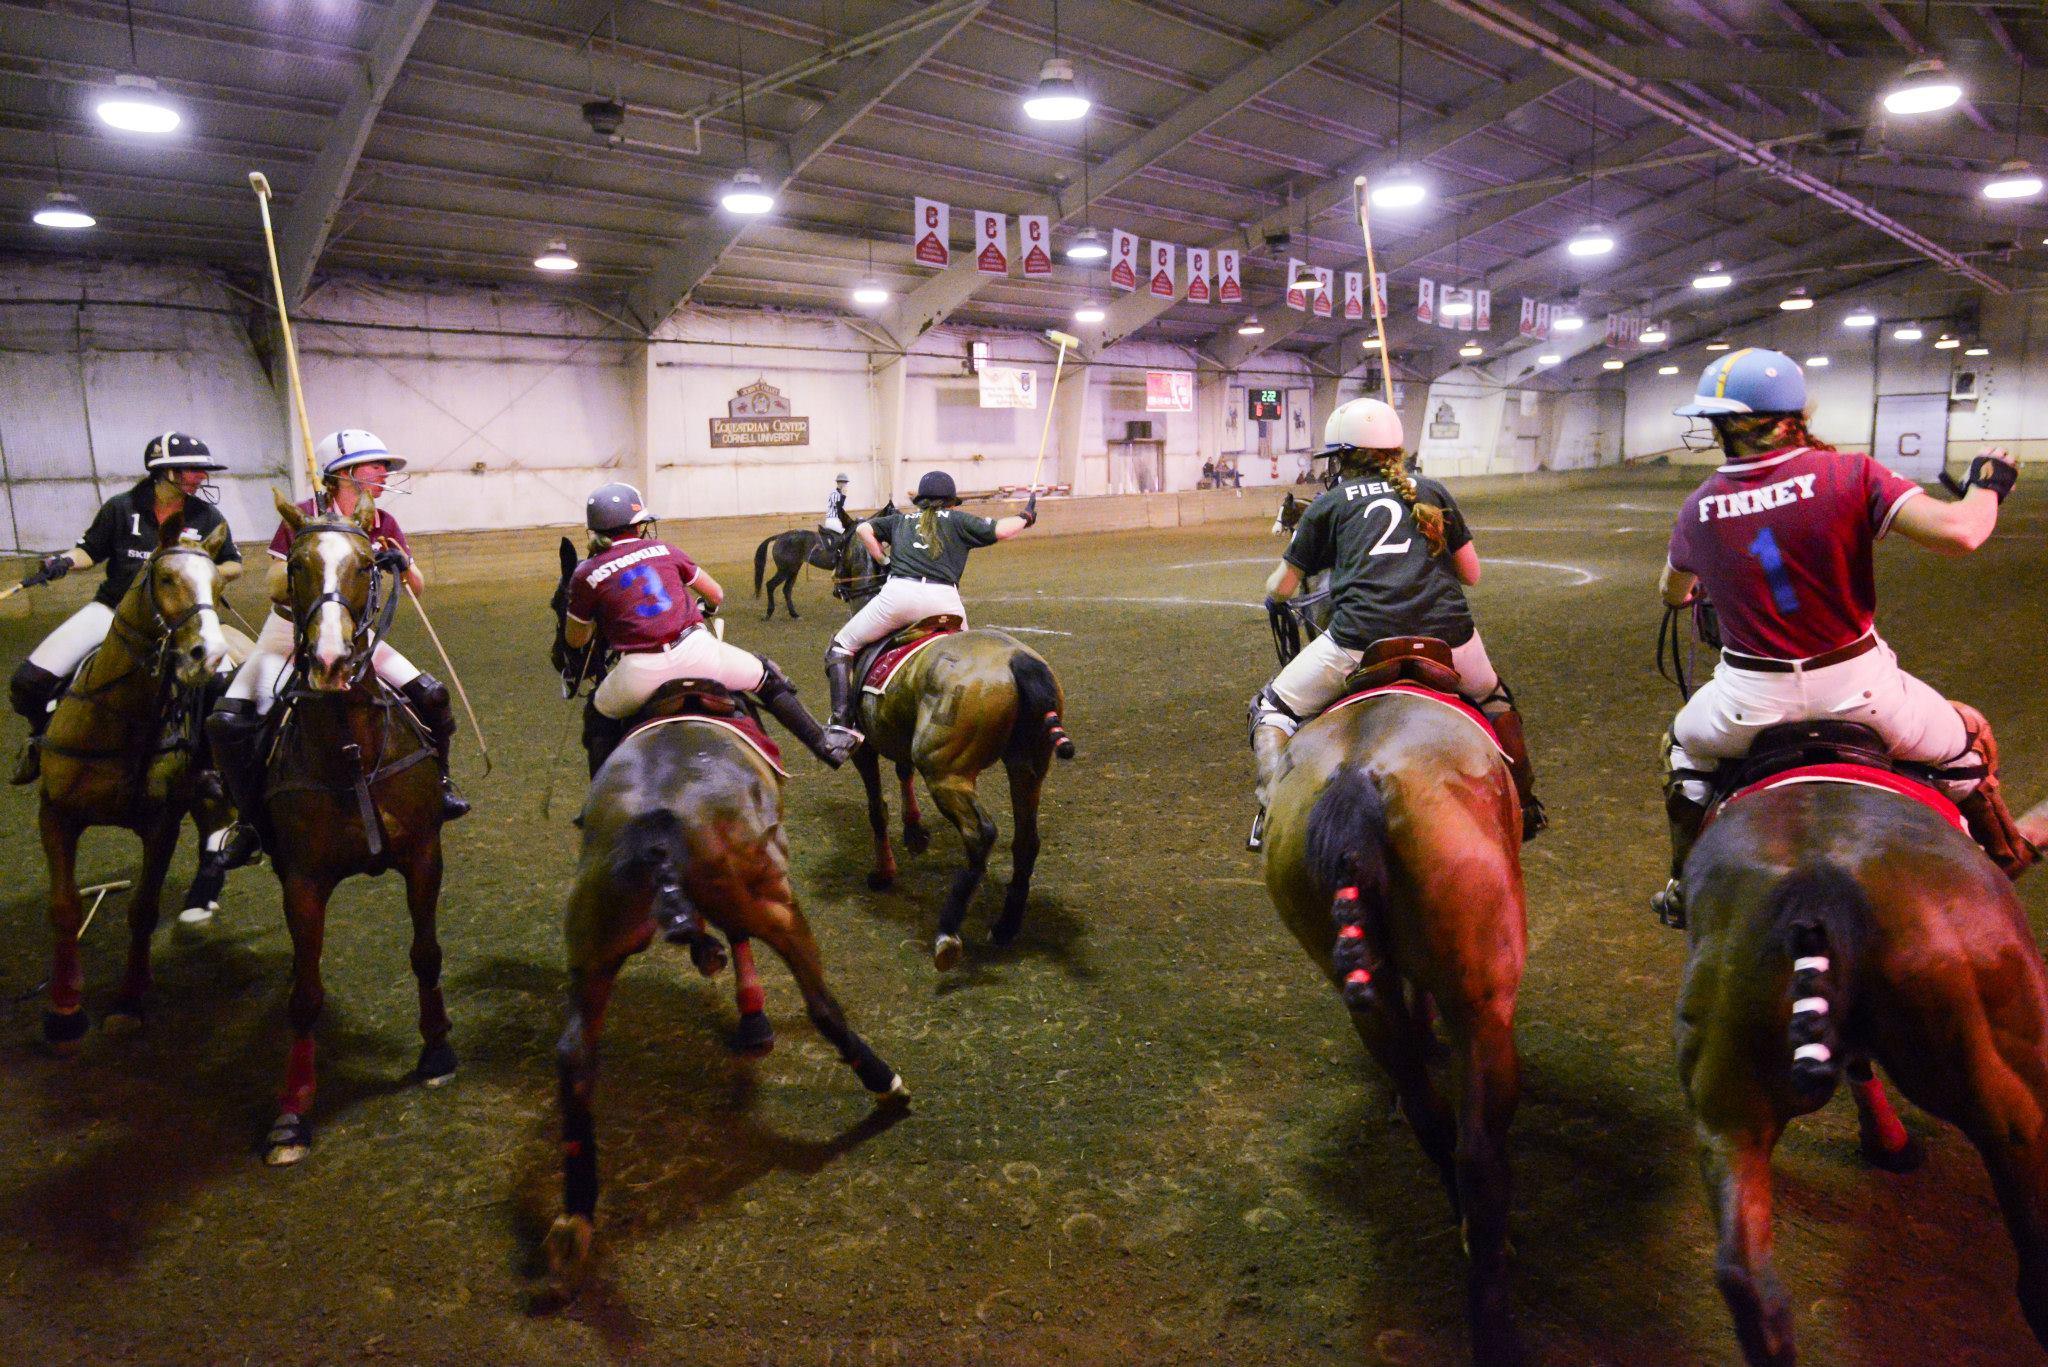 Bill Fields Tournament, Ithaca, 2014. Photos by Jacob Reiskin '17